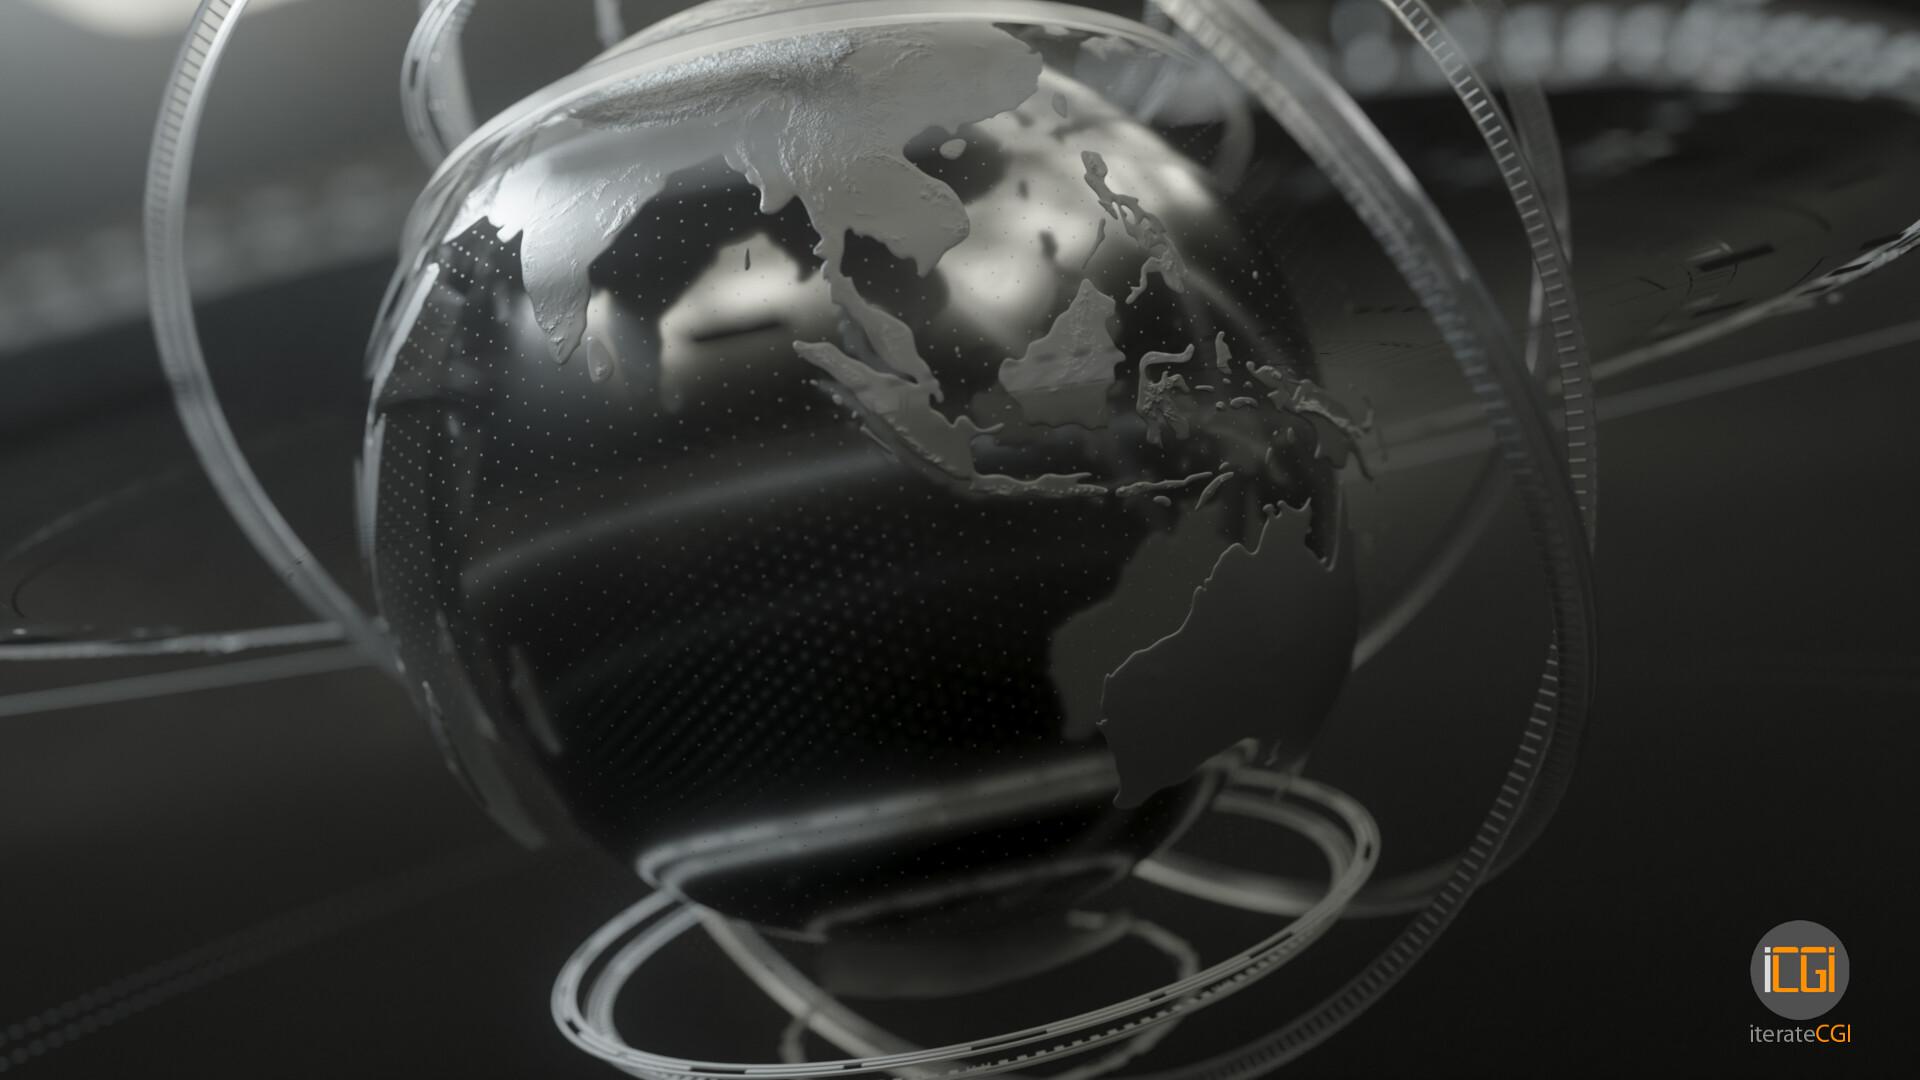 Johan de leenheer globe motion graphic 10